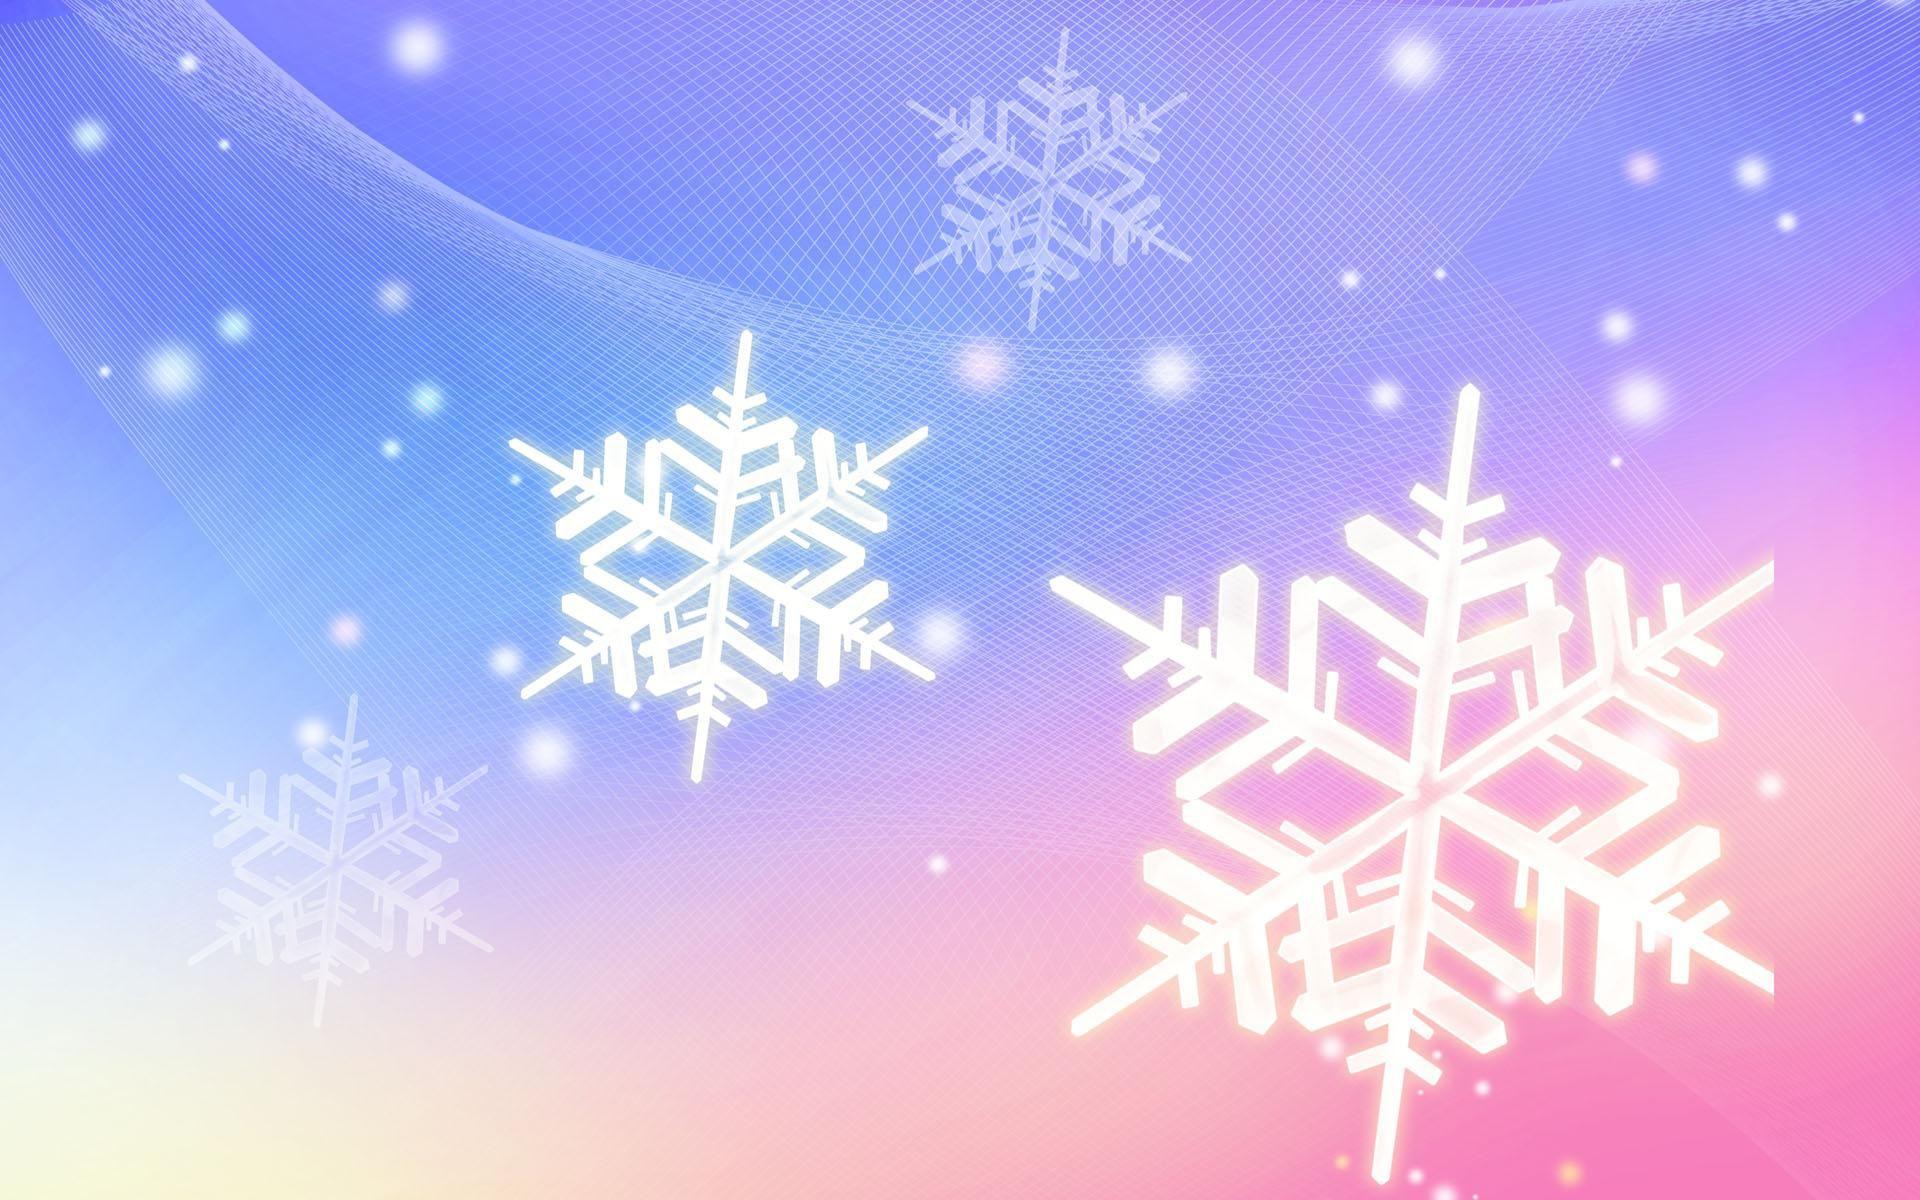 web dvittands honorsenglish background snowflake images wallpaper